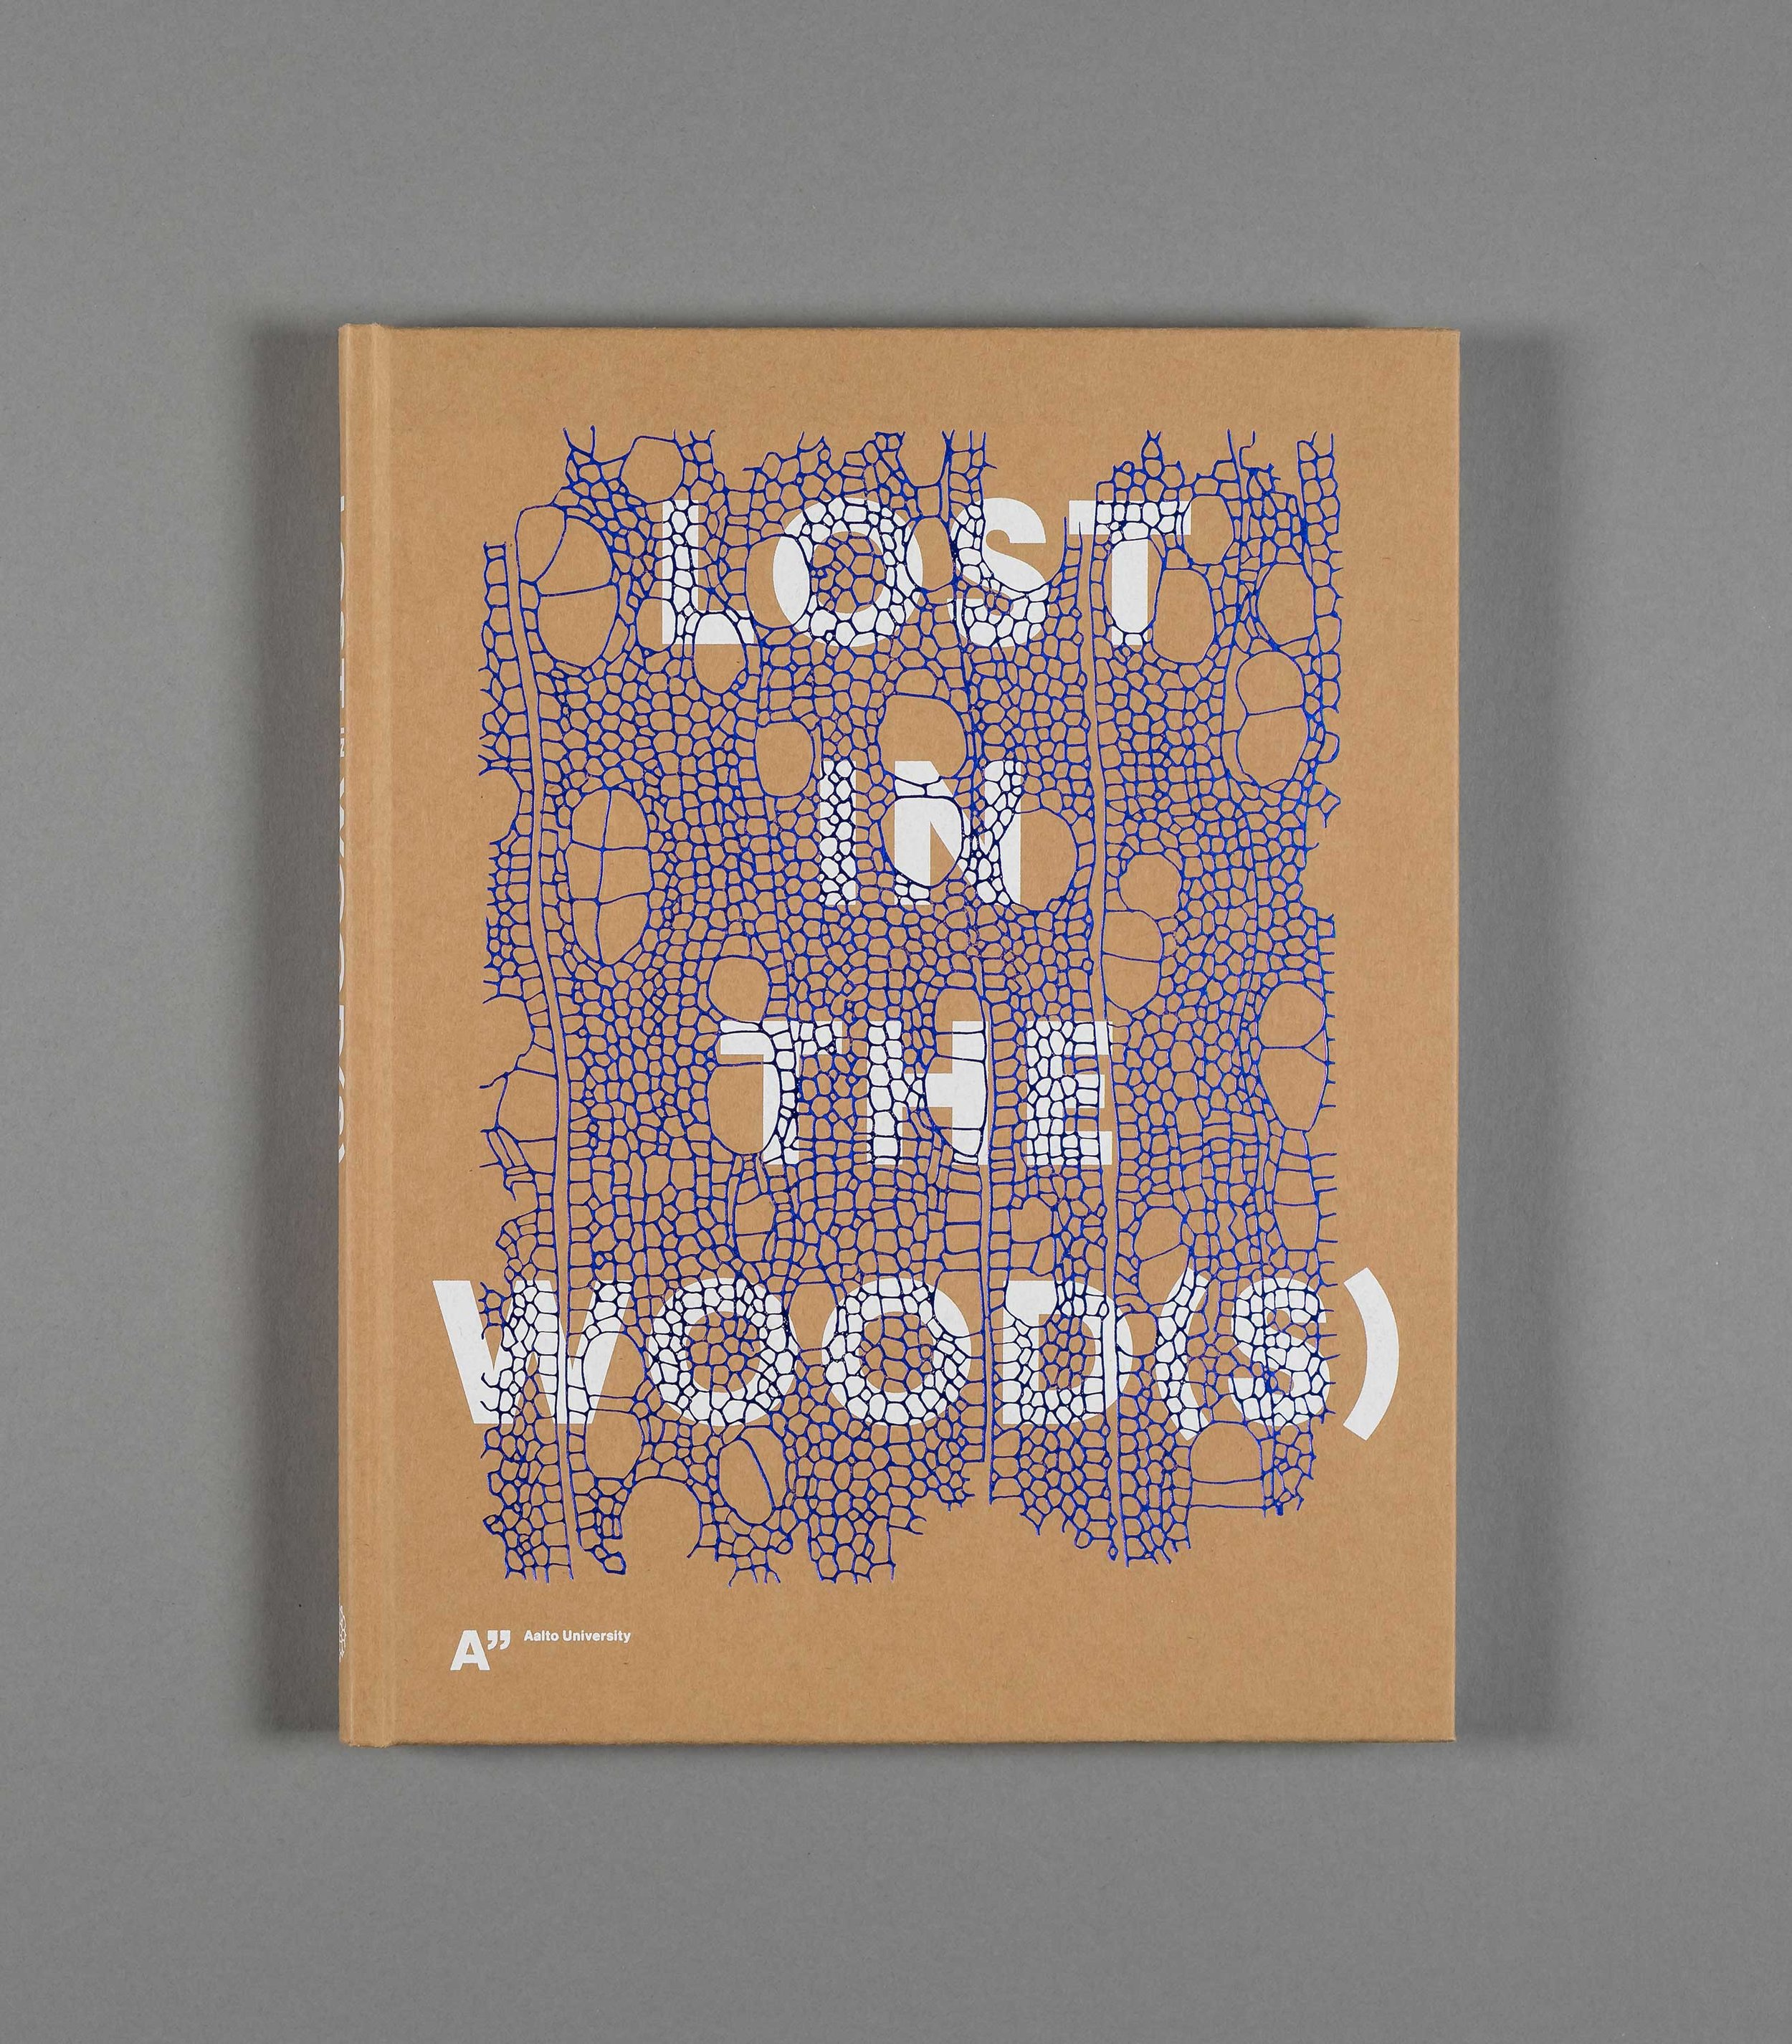 Lost_in_the_woods-001.jpg